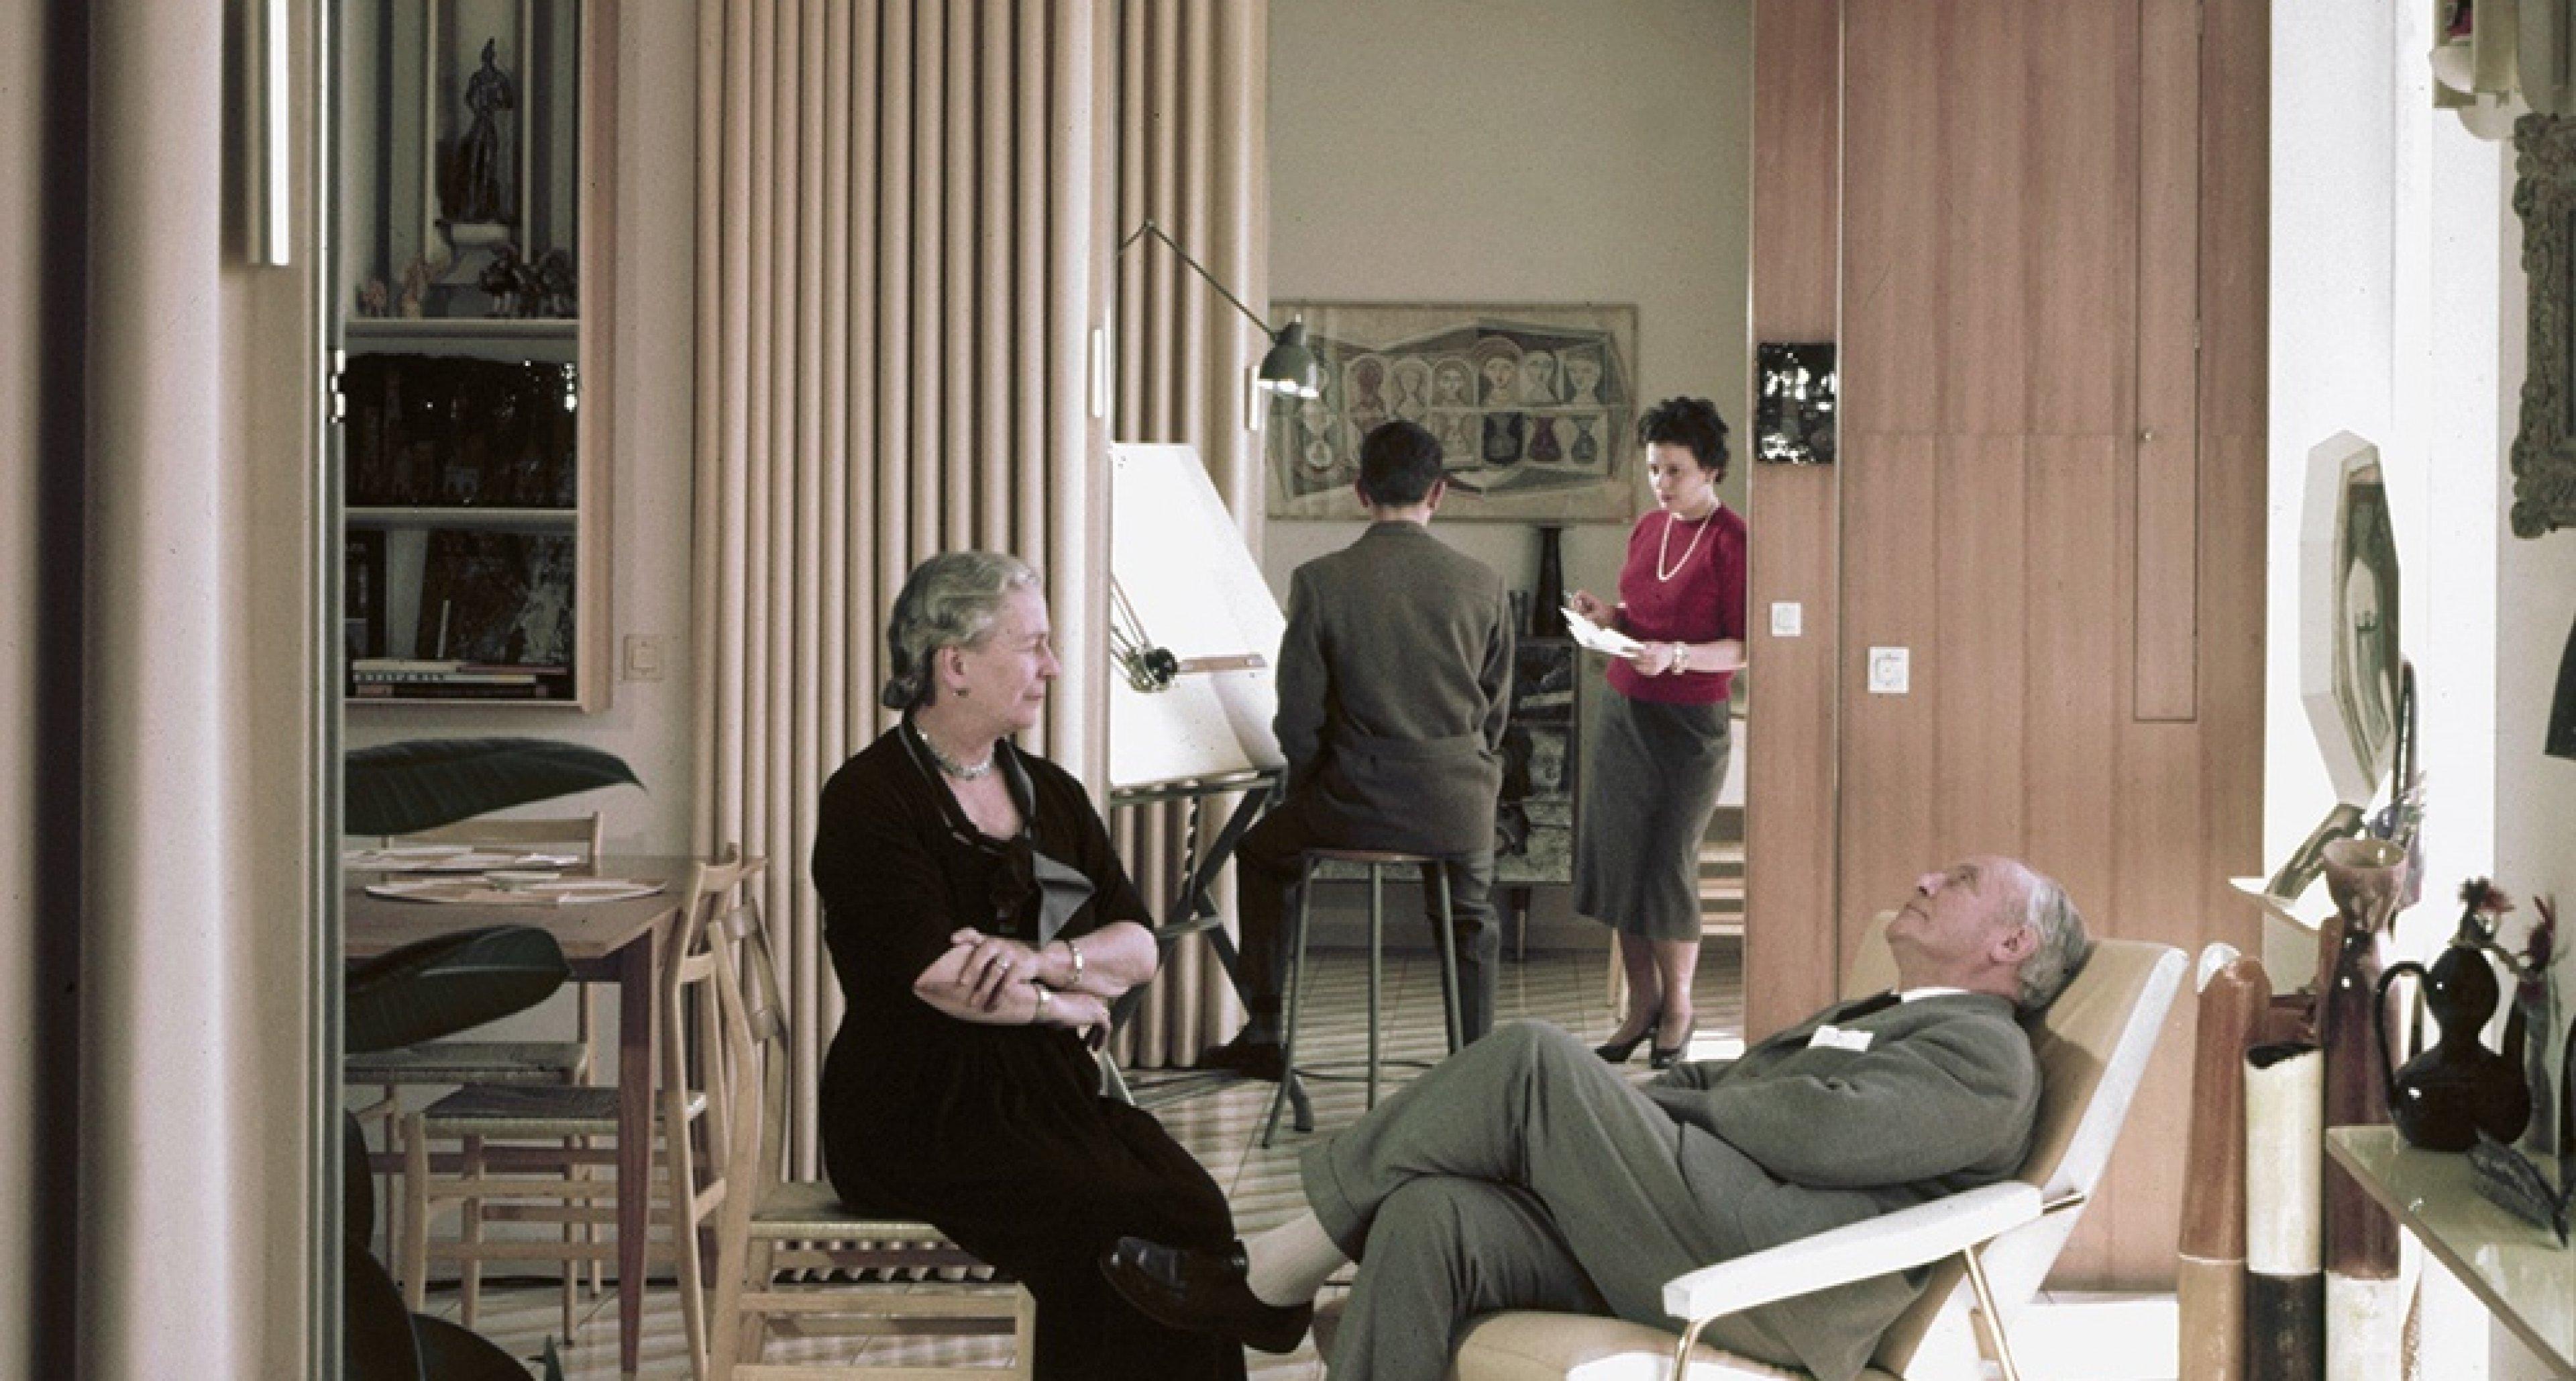 Gio Ponti and Giulia Ponti, Via Dezza, 1957 © Gio Ponti Archives